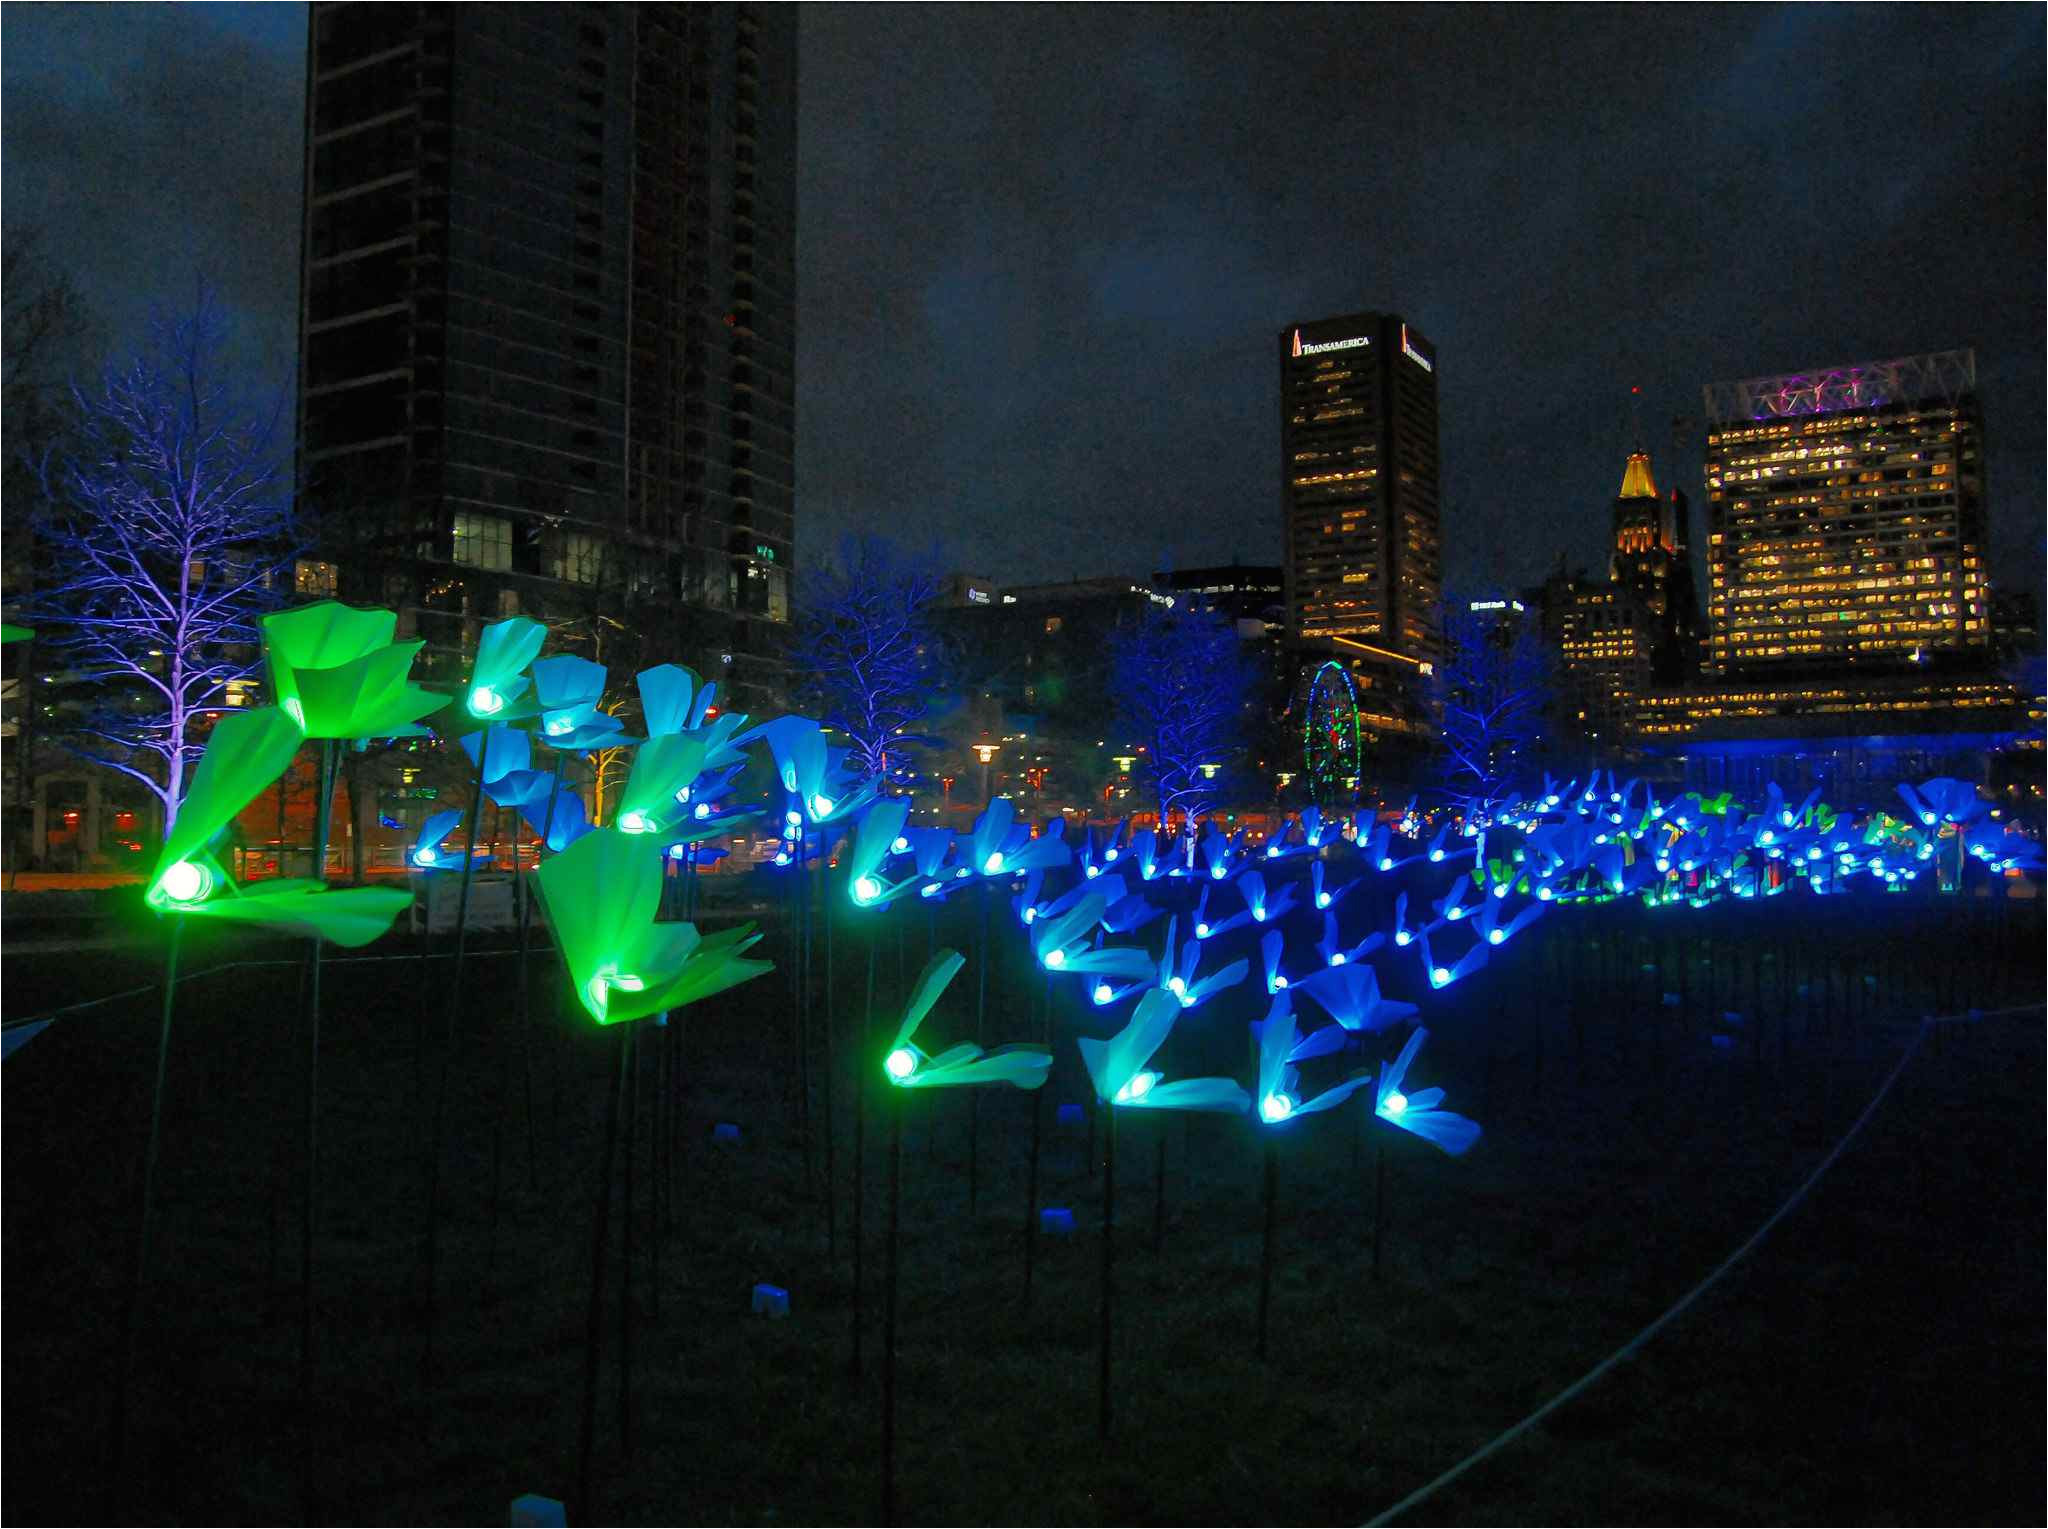 city light festival in baltimore maryland